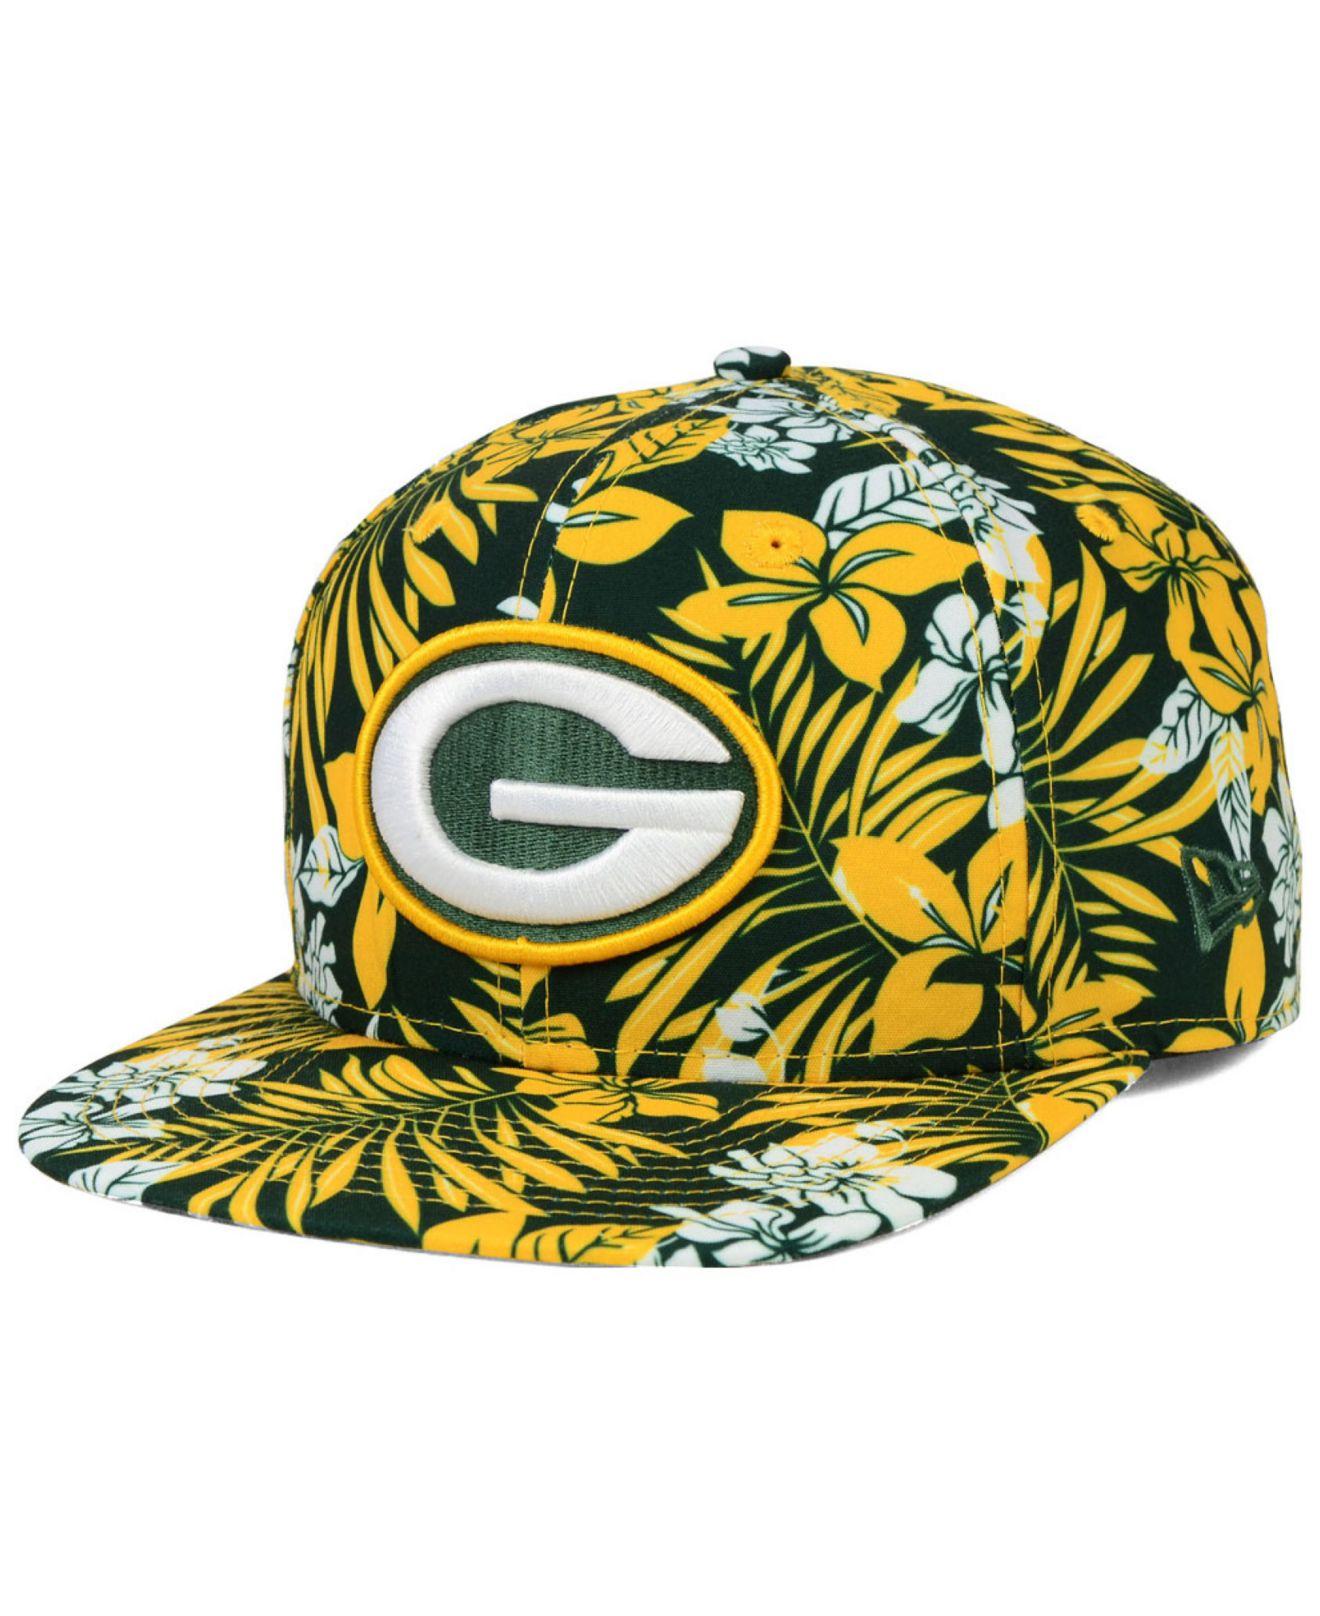 2e6433c3 KTZ Green Bay Packers Wowie 9Fifty Snapback Cap for men